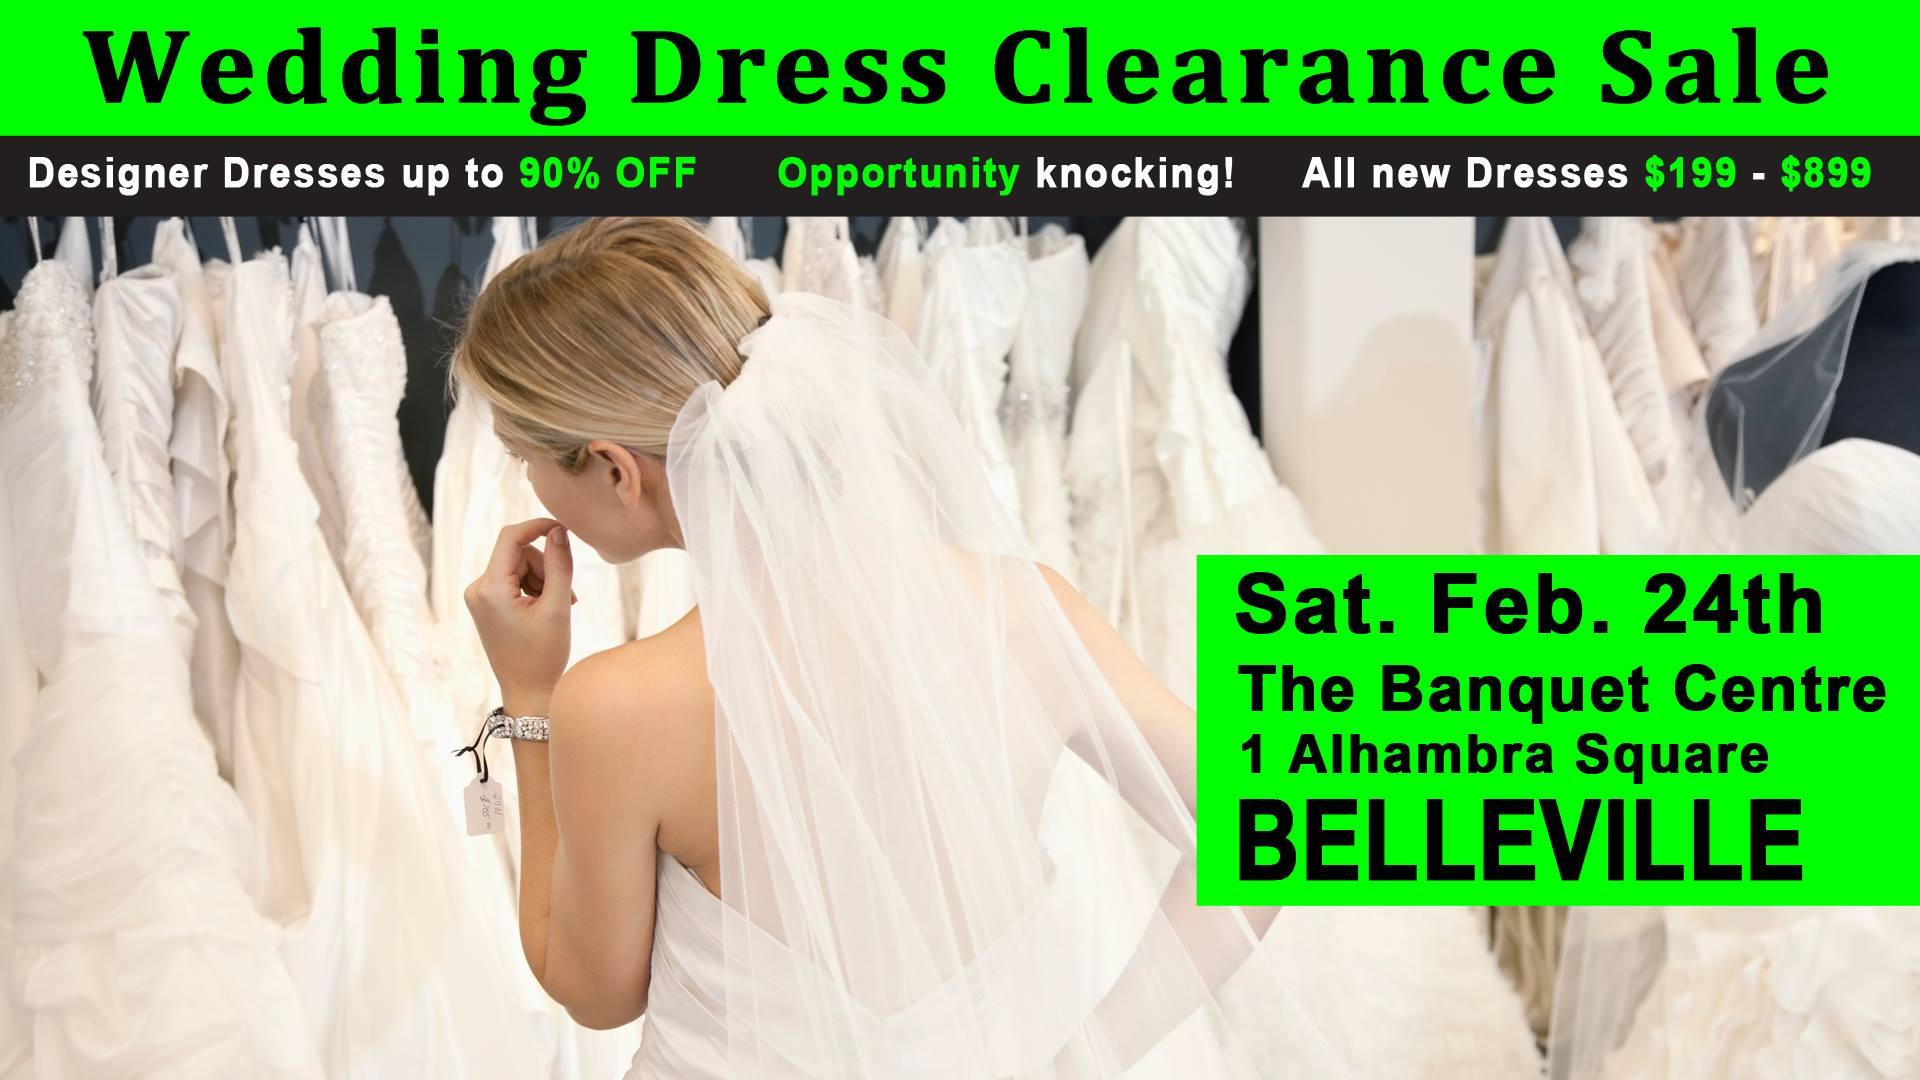 Pop Wedding Dress.Belleville Pop Up Wedding Dress Sale Bay Of Quinte Tourism